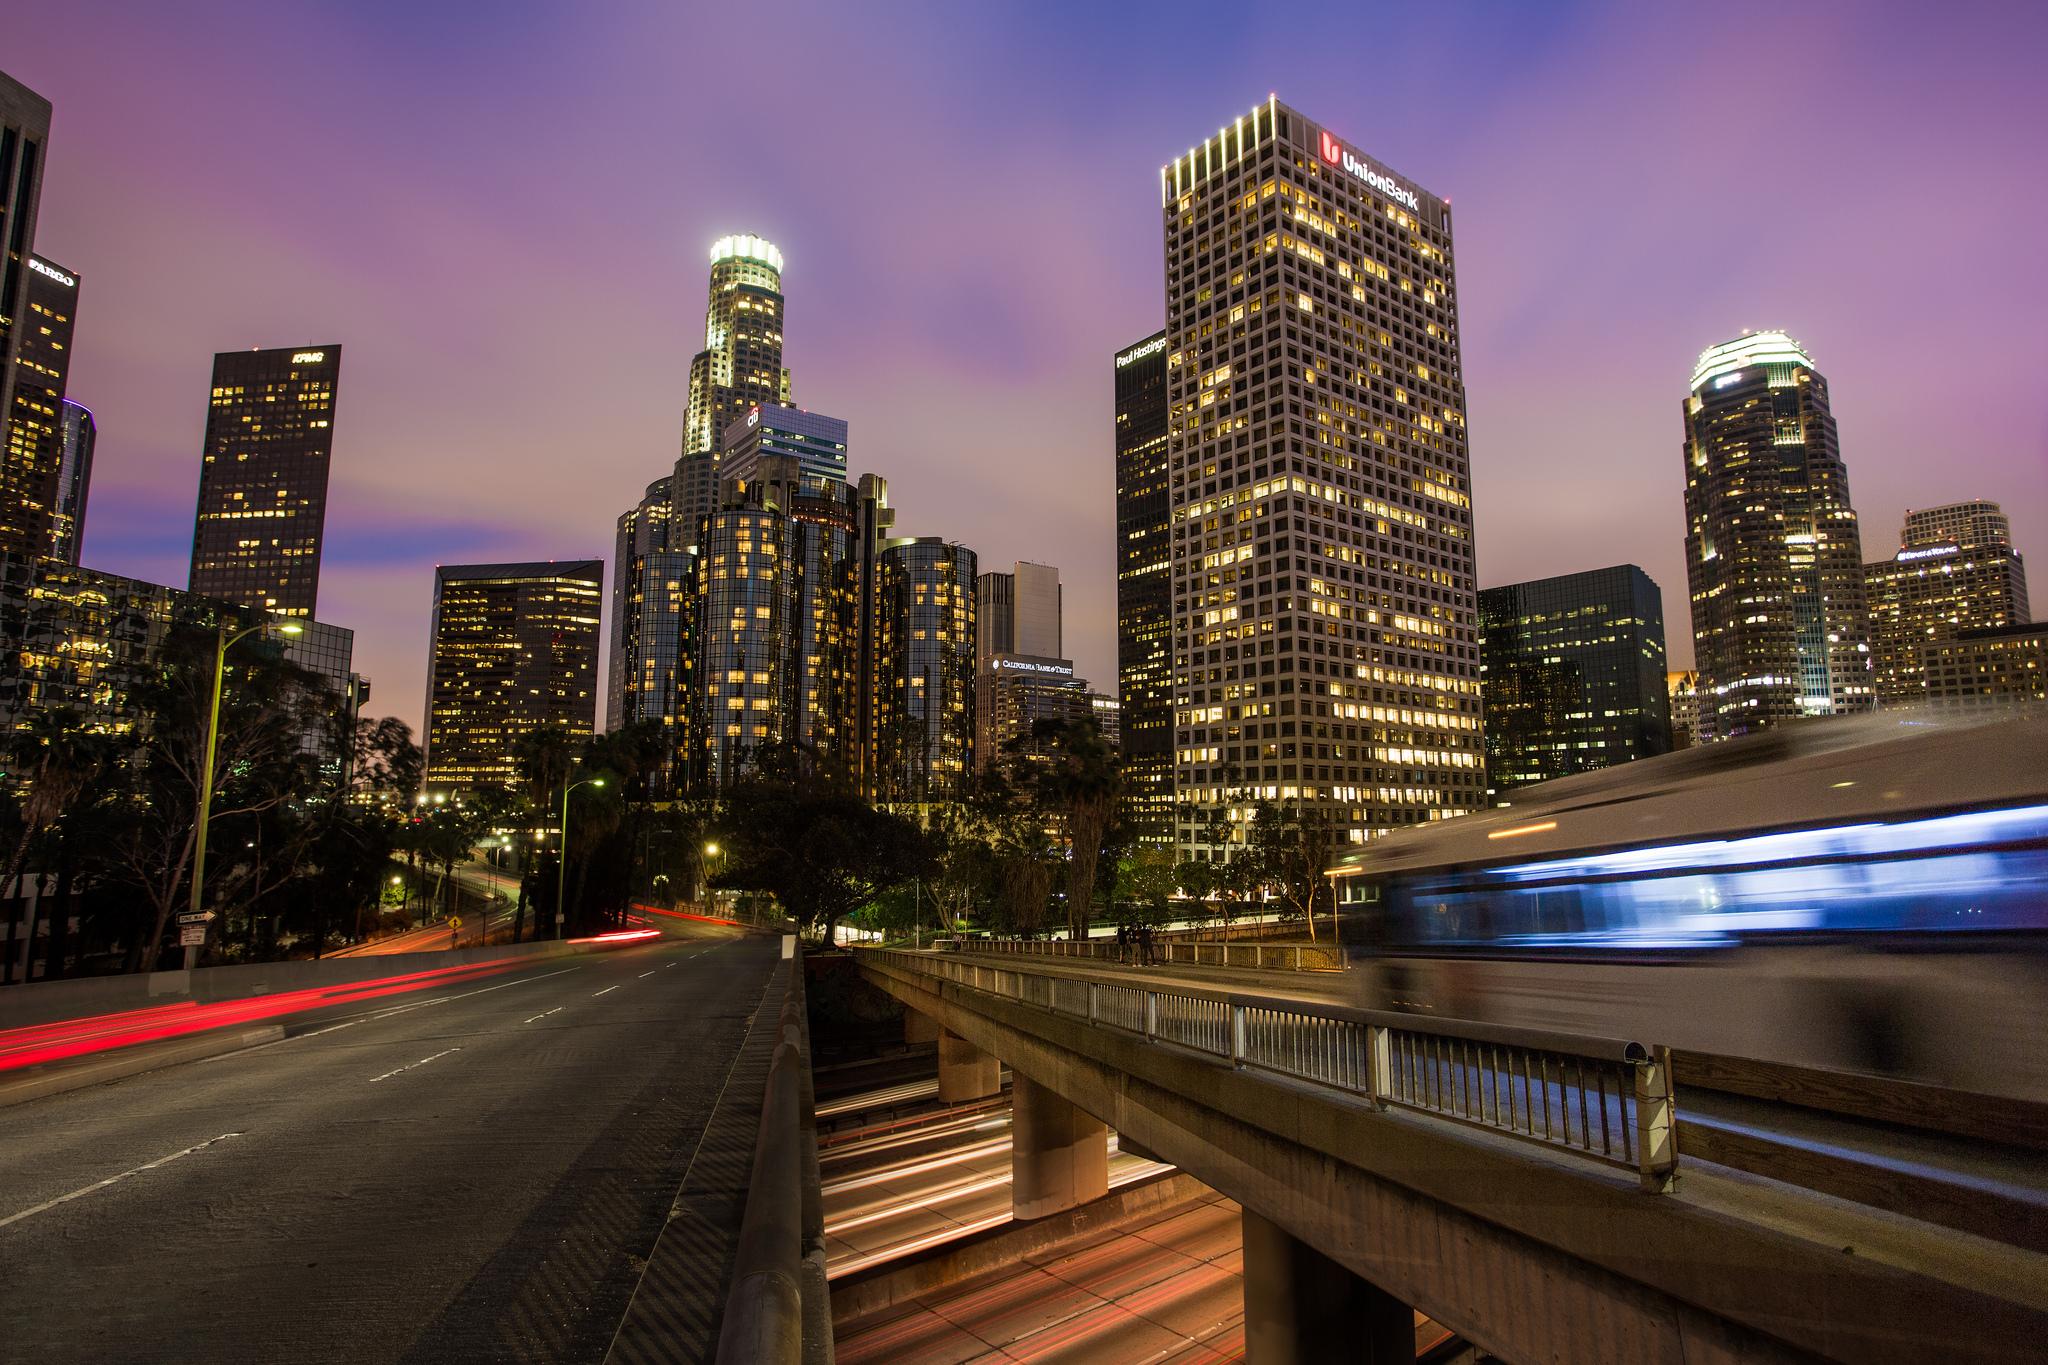 LA-Dash by Bobby Gibbons